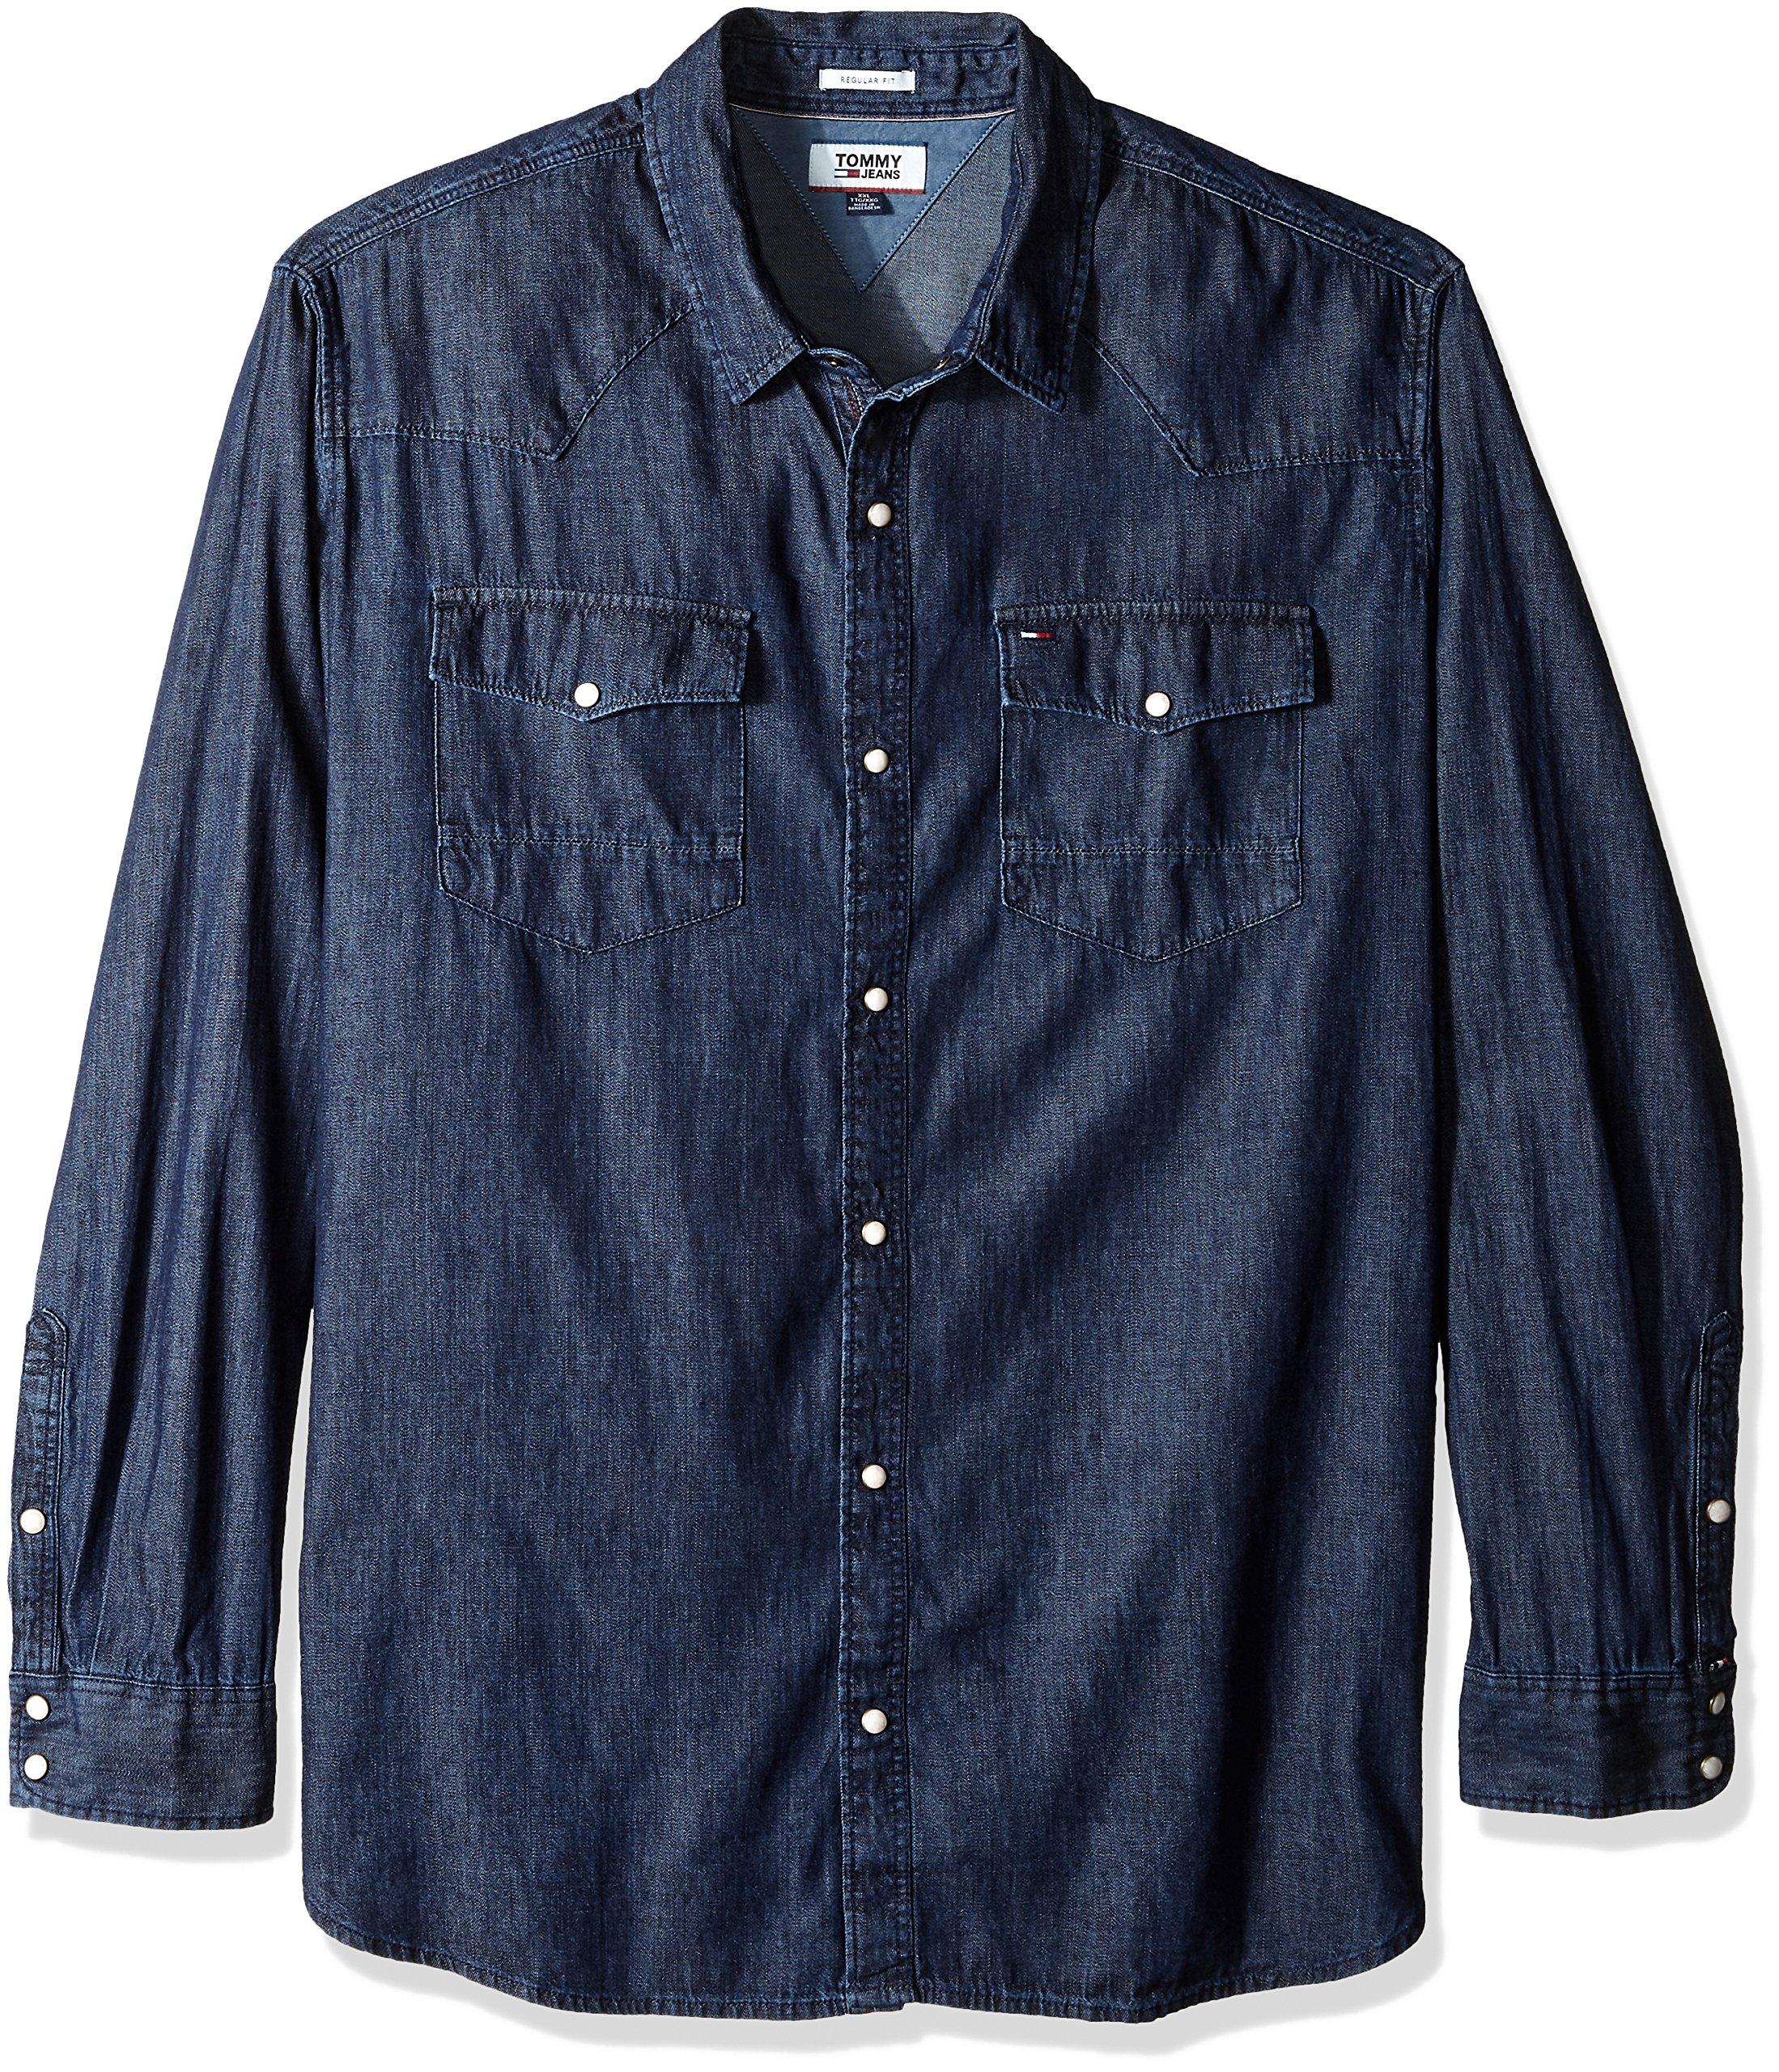 99e24350 Tommy Hilfiger Men's Denim Shirt with Snaps Long Sleeves - Denim Fit